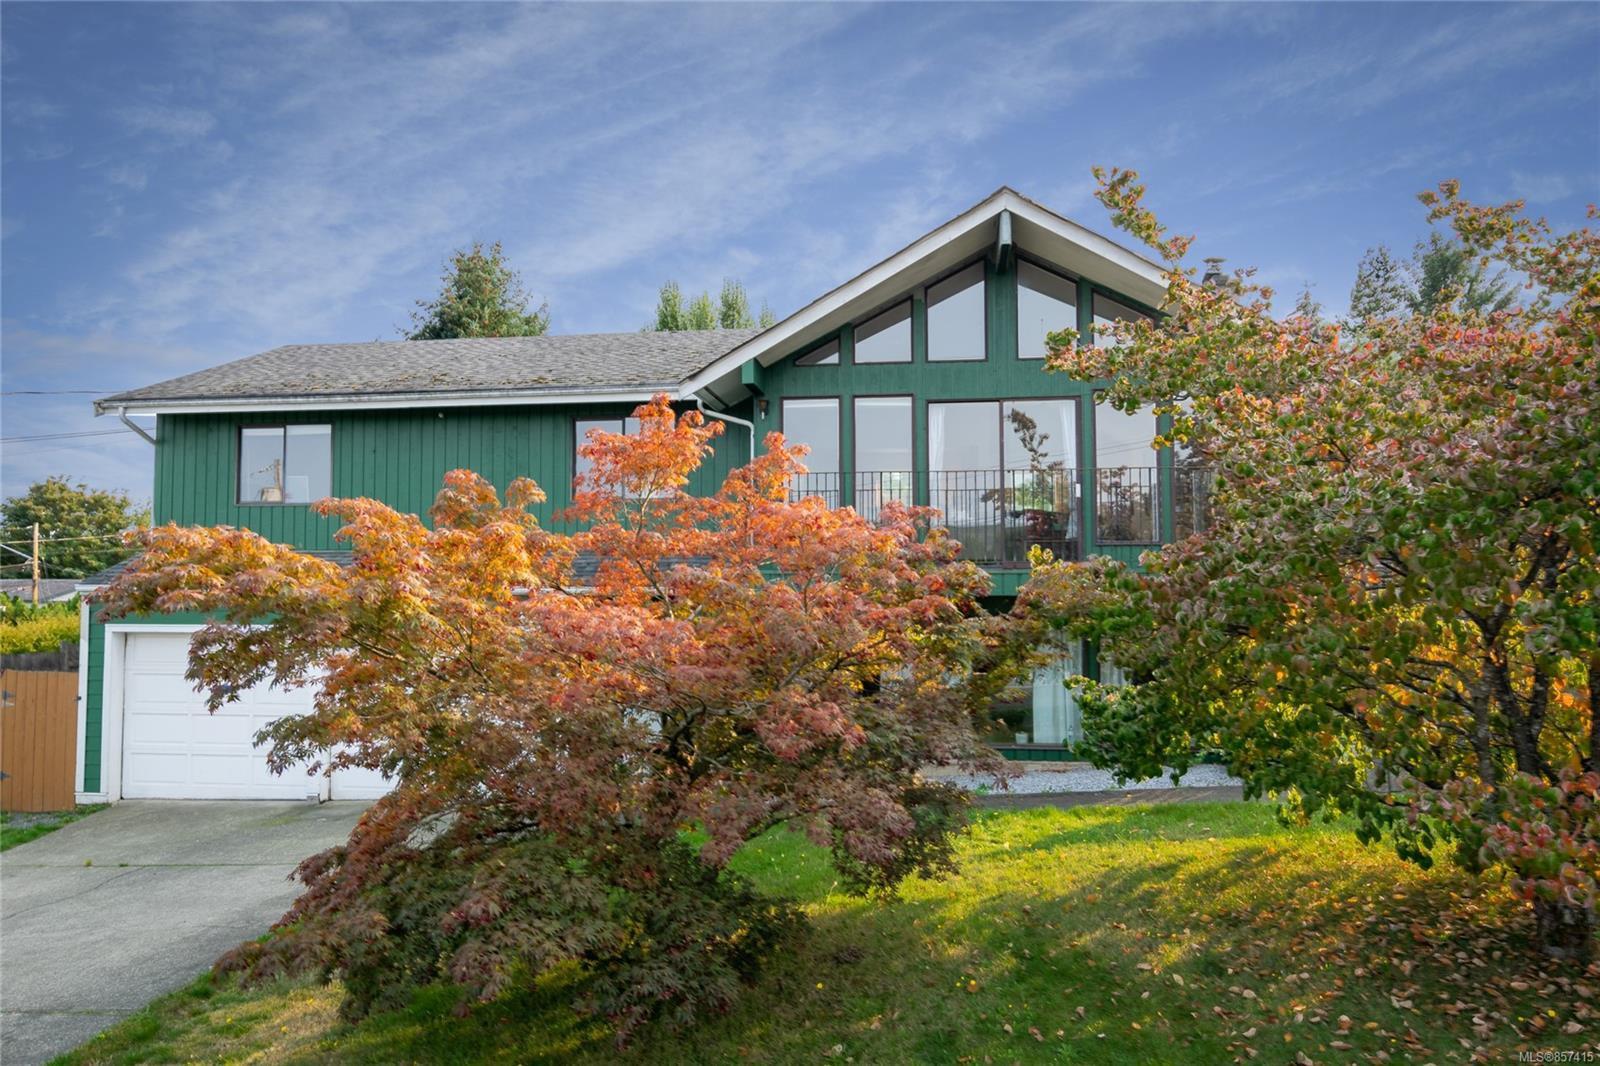 Main Photo: 559 Weber St in : Na South Nanaimo House for sale (Nanaimo)  : MLS®# 857415